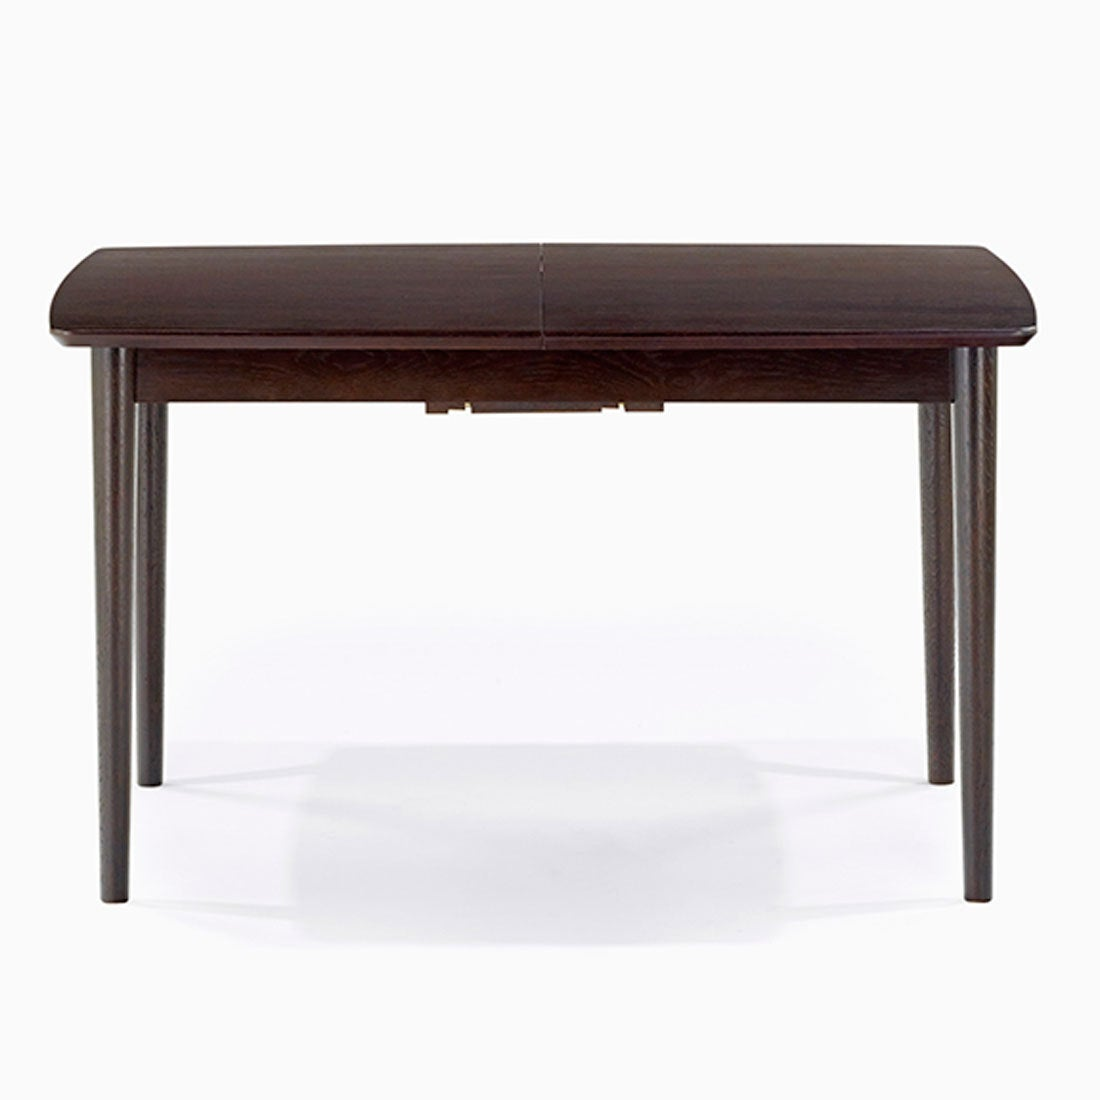 IDC OTSUKA/大塚家具 ダイニングテーブル(伸長式) ウイング DB 1250タイプ (ダークブラウン)【返品不可商品】